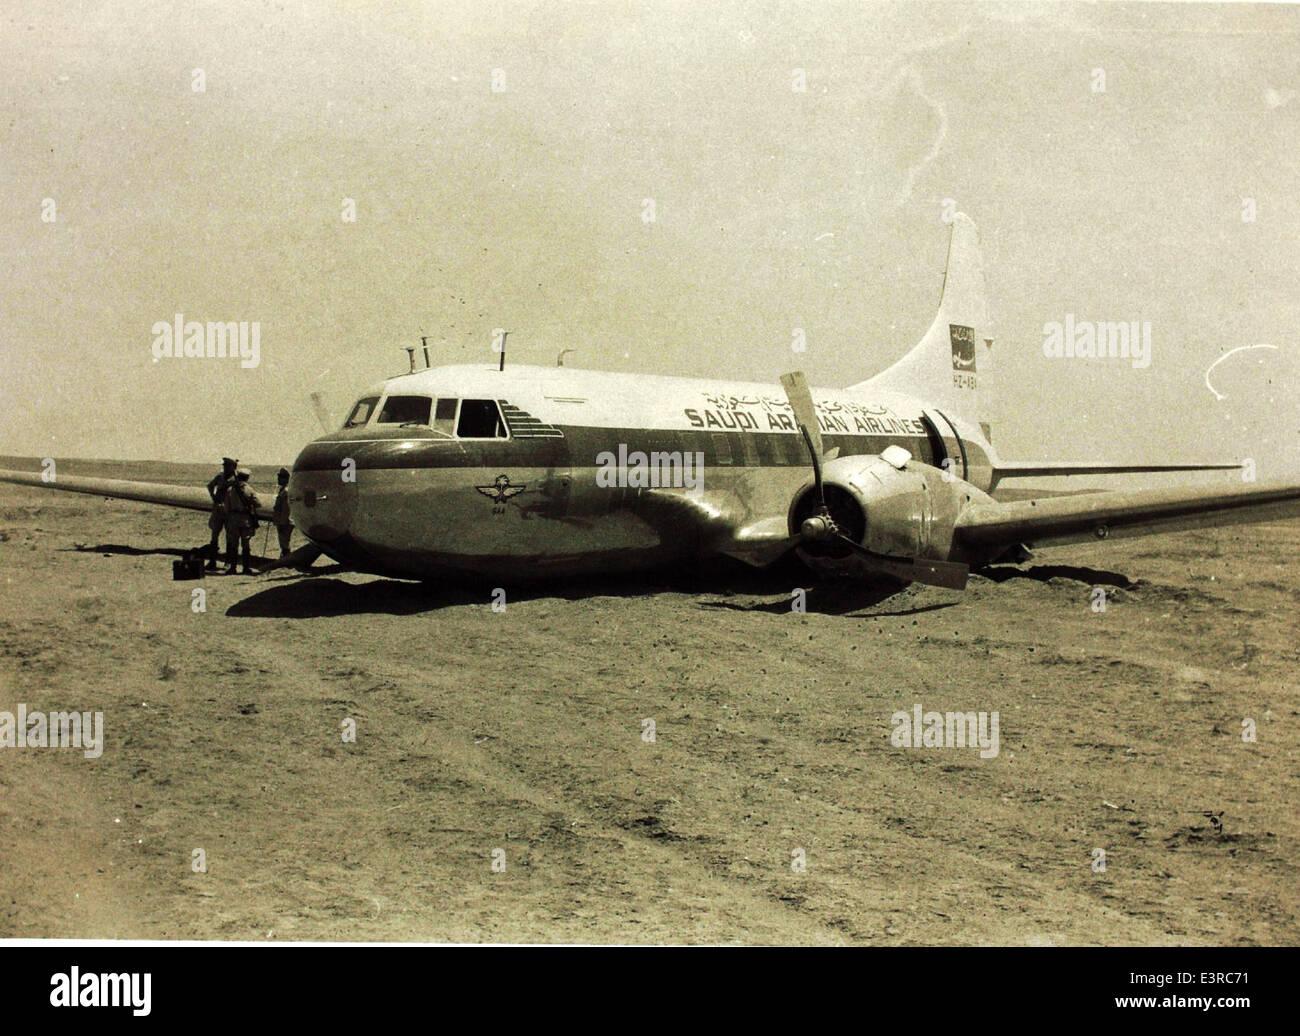 Convair 340 Crash Stock Photo